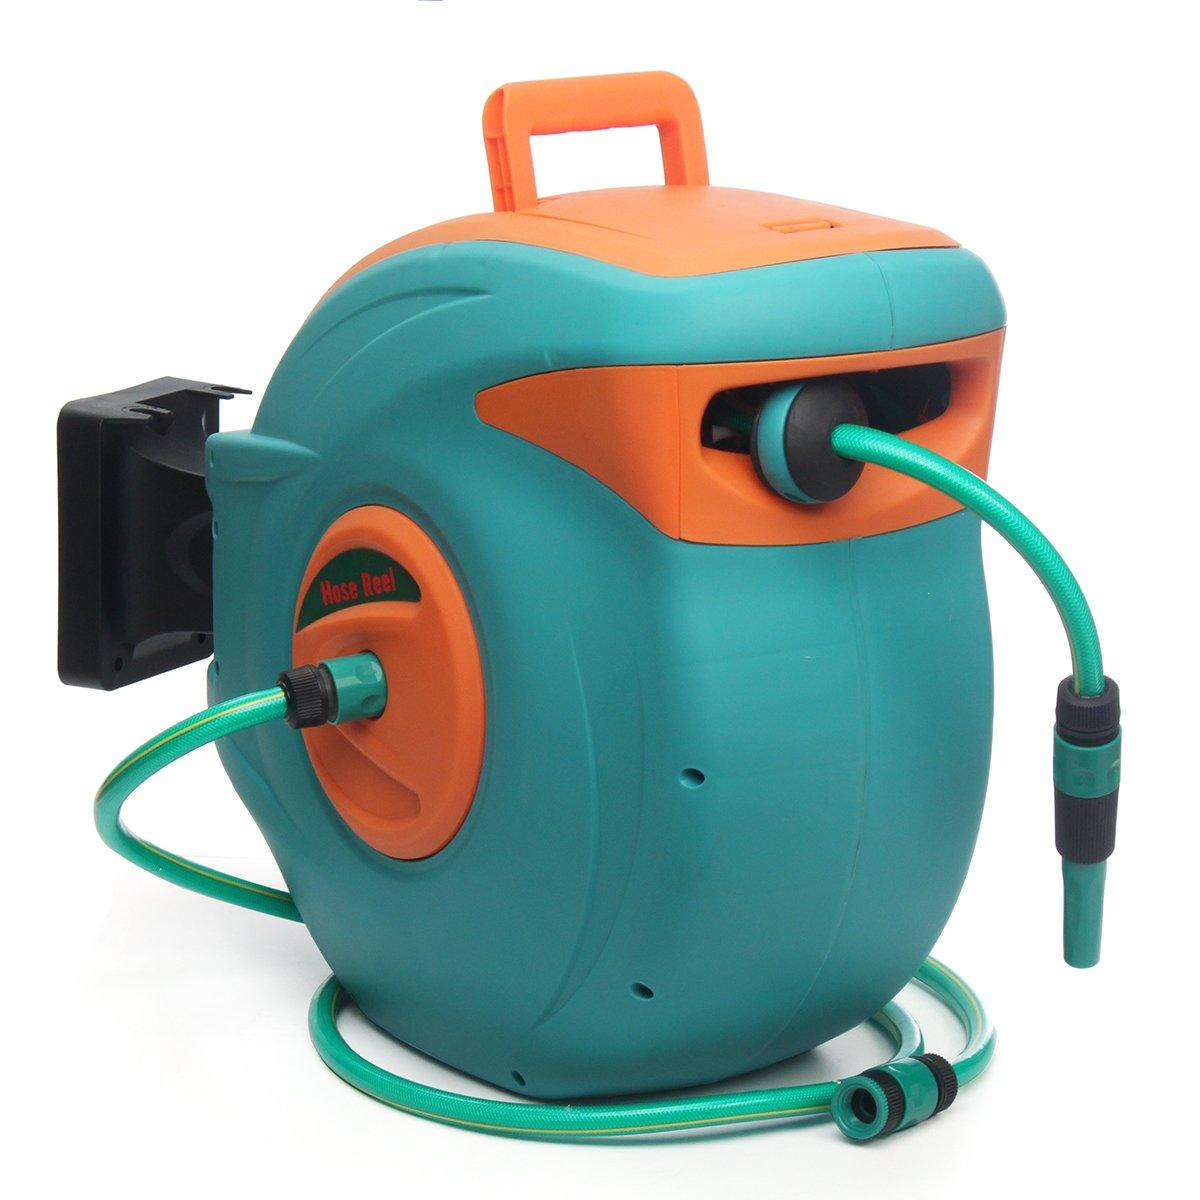 HITSAN XBW-05 30M Auto Rewind Reel Hose Garden Retractable Water Hose Reel Water Storage Spray Tool One Piece